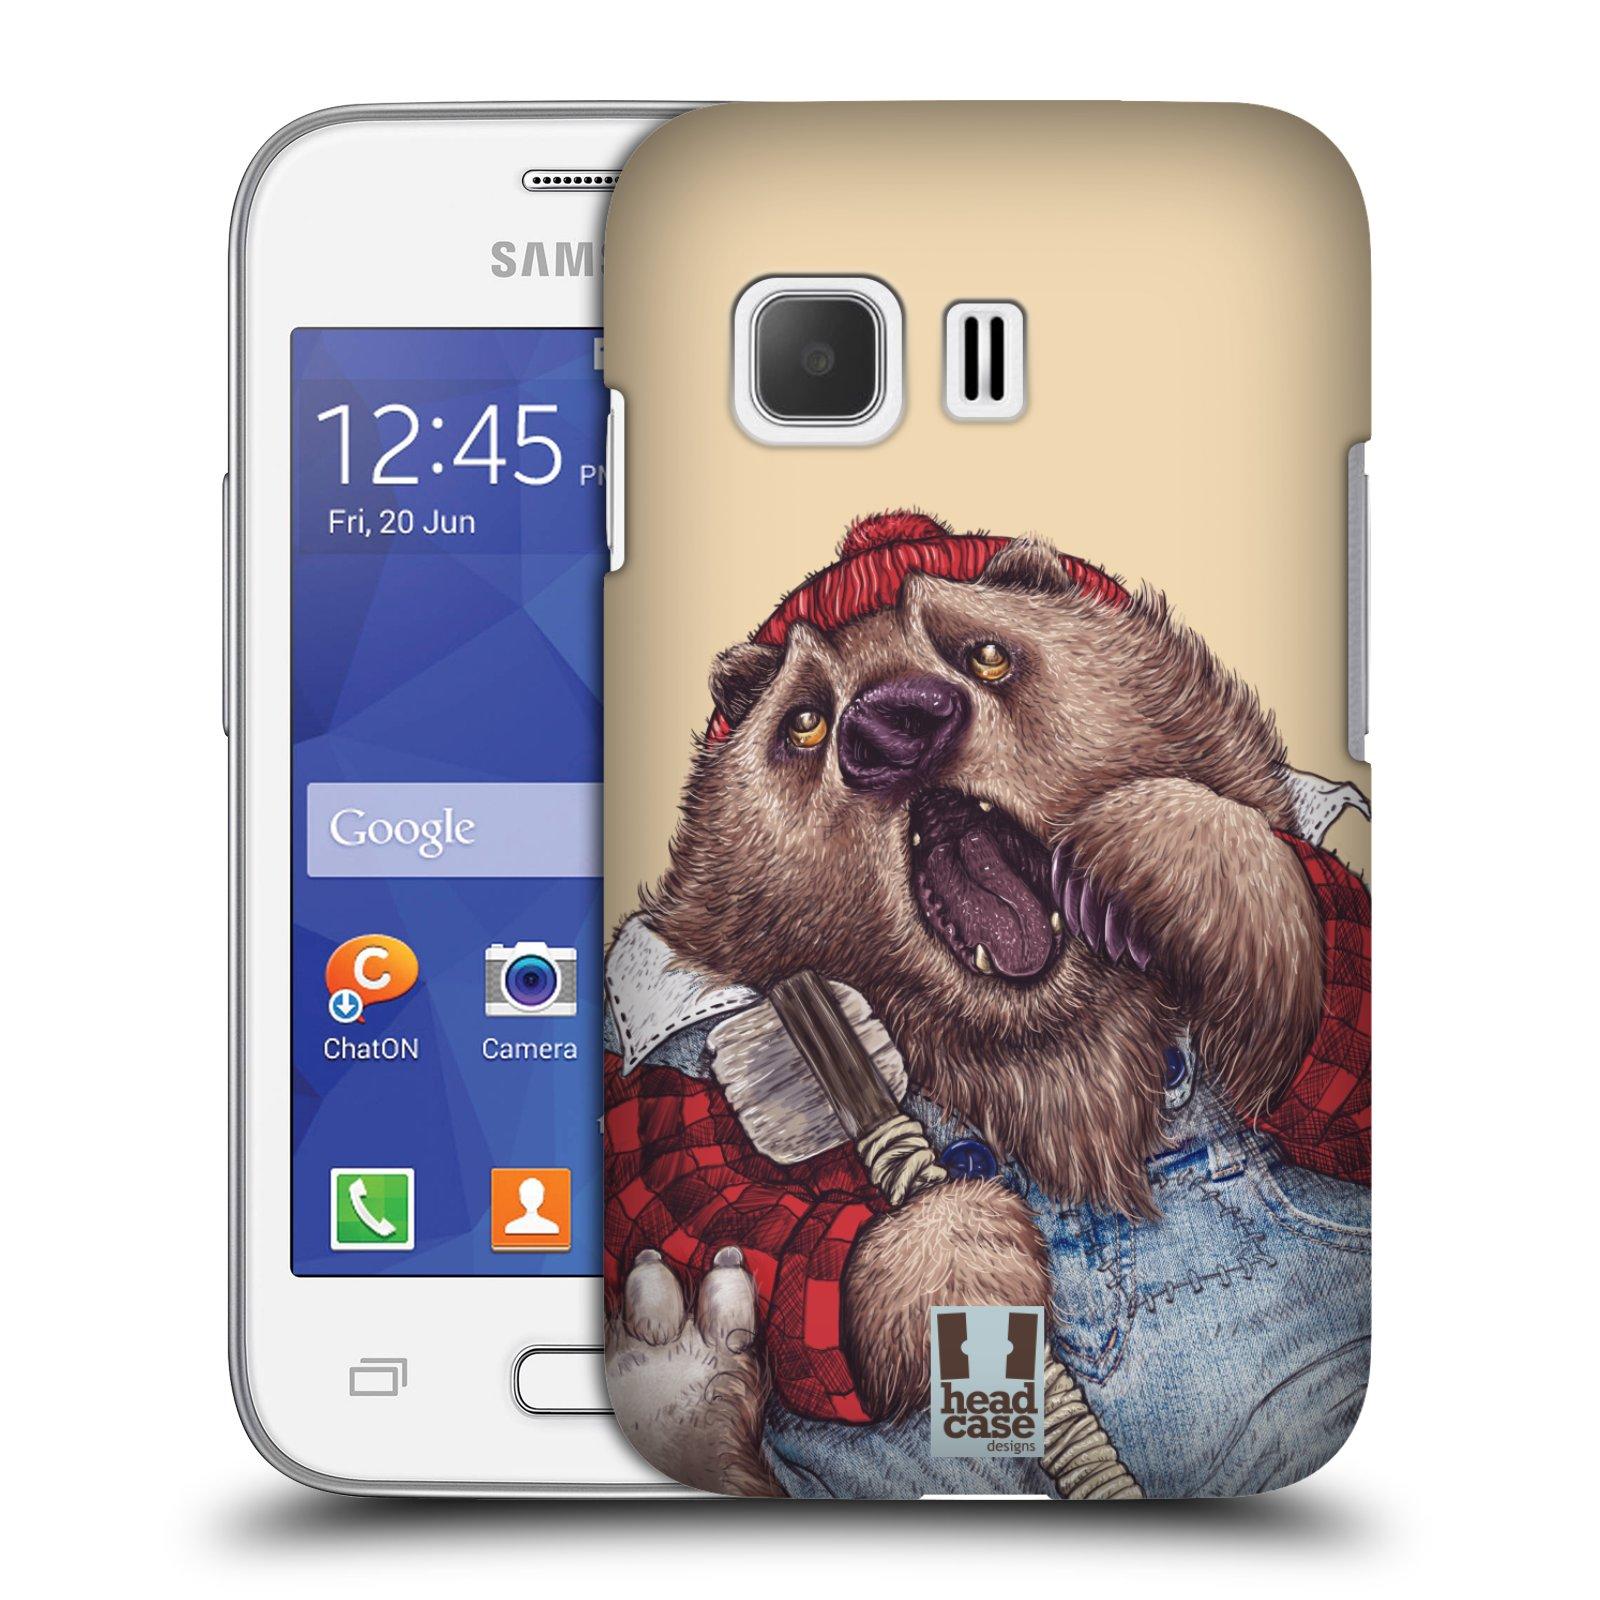 HEAD CASE plastový obal na mobil SAMSUNG Galaxy Young 2 (G130) vzor Kreslená zvířátka medvěd